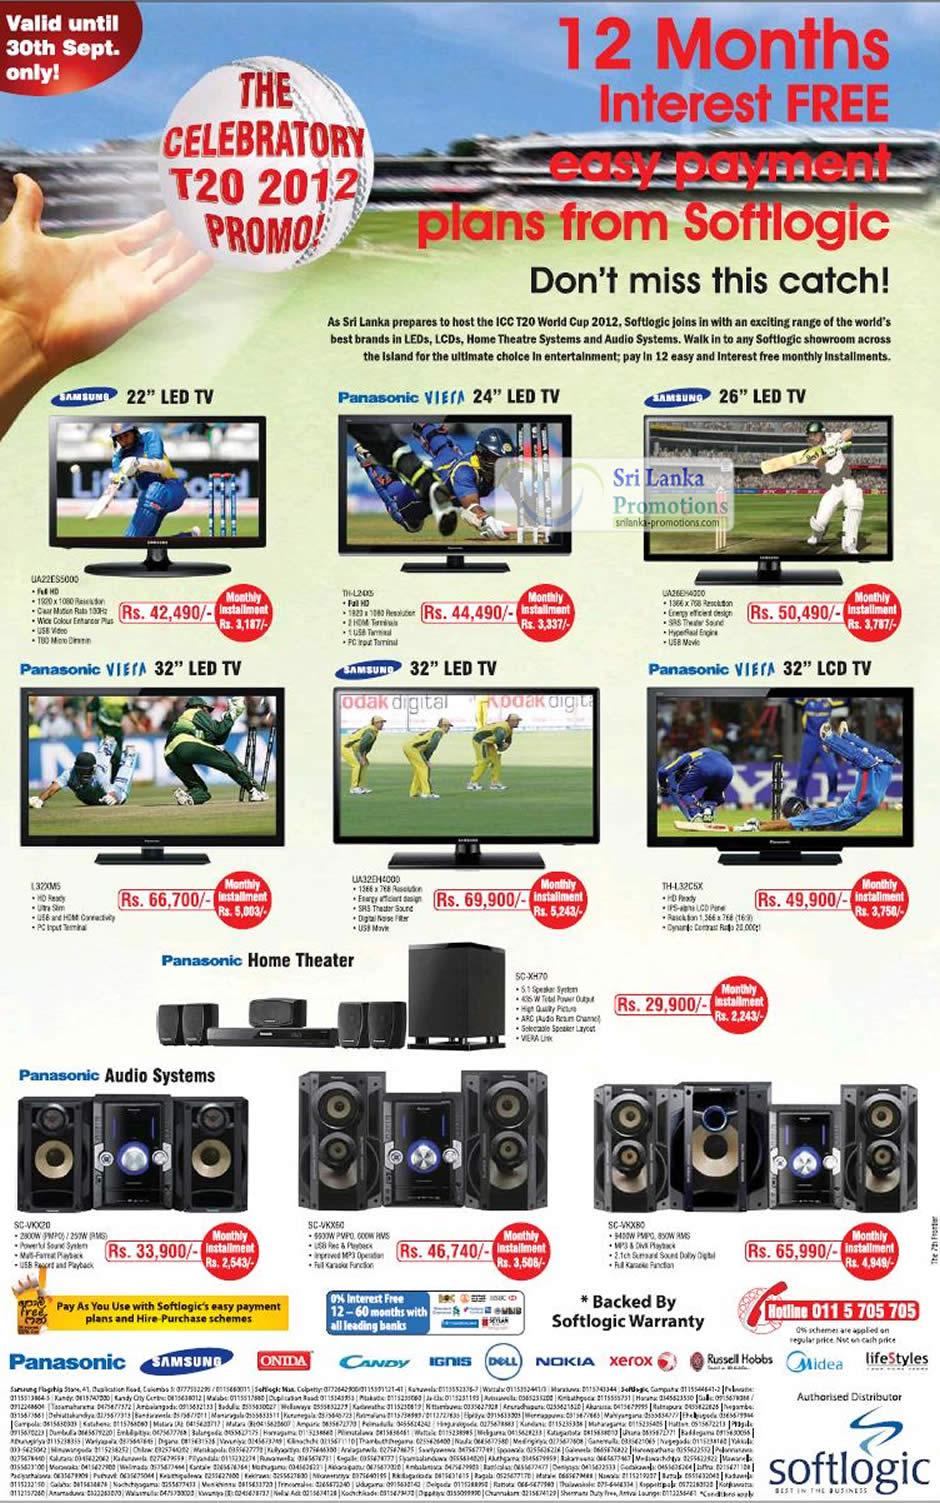 Samsung LED TV UA22ES5000, Panasonic VIERA LED TV TH-L24X5, Panasonic VIERA LED TV L32XM5, Samsung LED TV UA32EK4000, Samsung LED TV UA26EH4000, Panasonic Viera LED TV TH-L32C5X, Panasonic Home Theater SC-XH70, Panasonic Audio System SC-VKX20, Panasonic Audio System SC-VKX60, Panasonic Audio System SC-VKX80